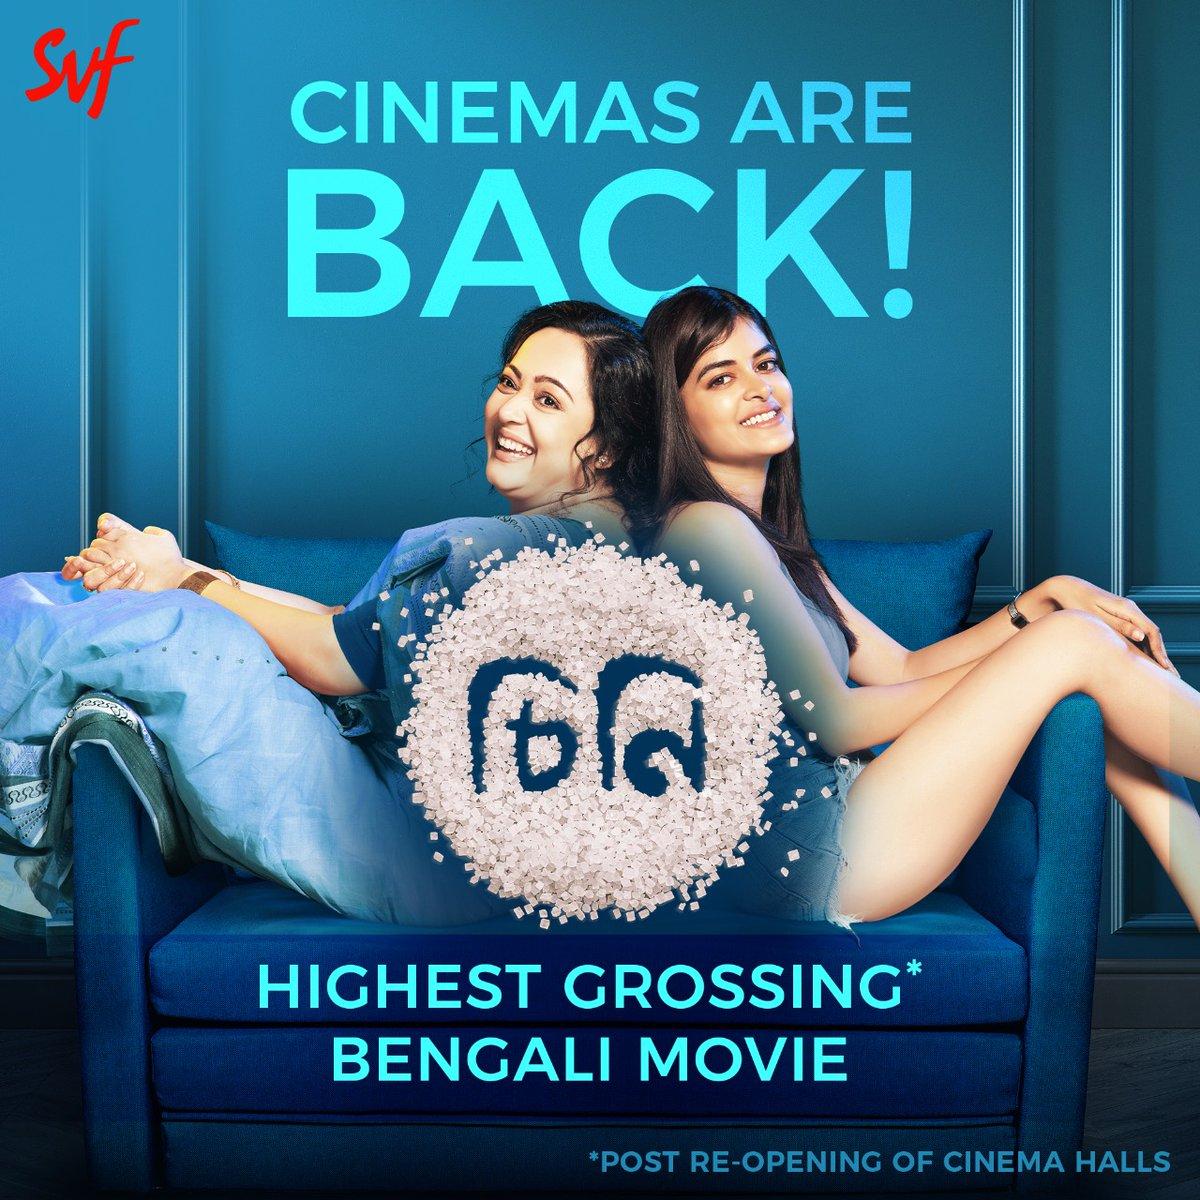 #Cheeni enters the 5th week as the biggest grossing Bengali movie post re-opening of cinema halls. #CinemasAreBack  @madhumitact @AdhyaAparajita @iamsaaurav @talkmainak @SVFsocial